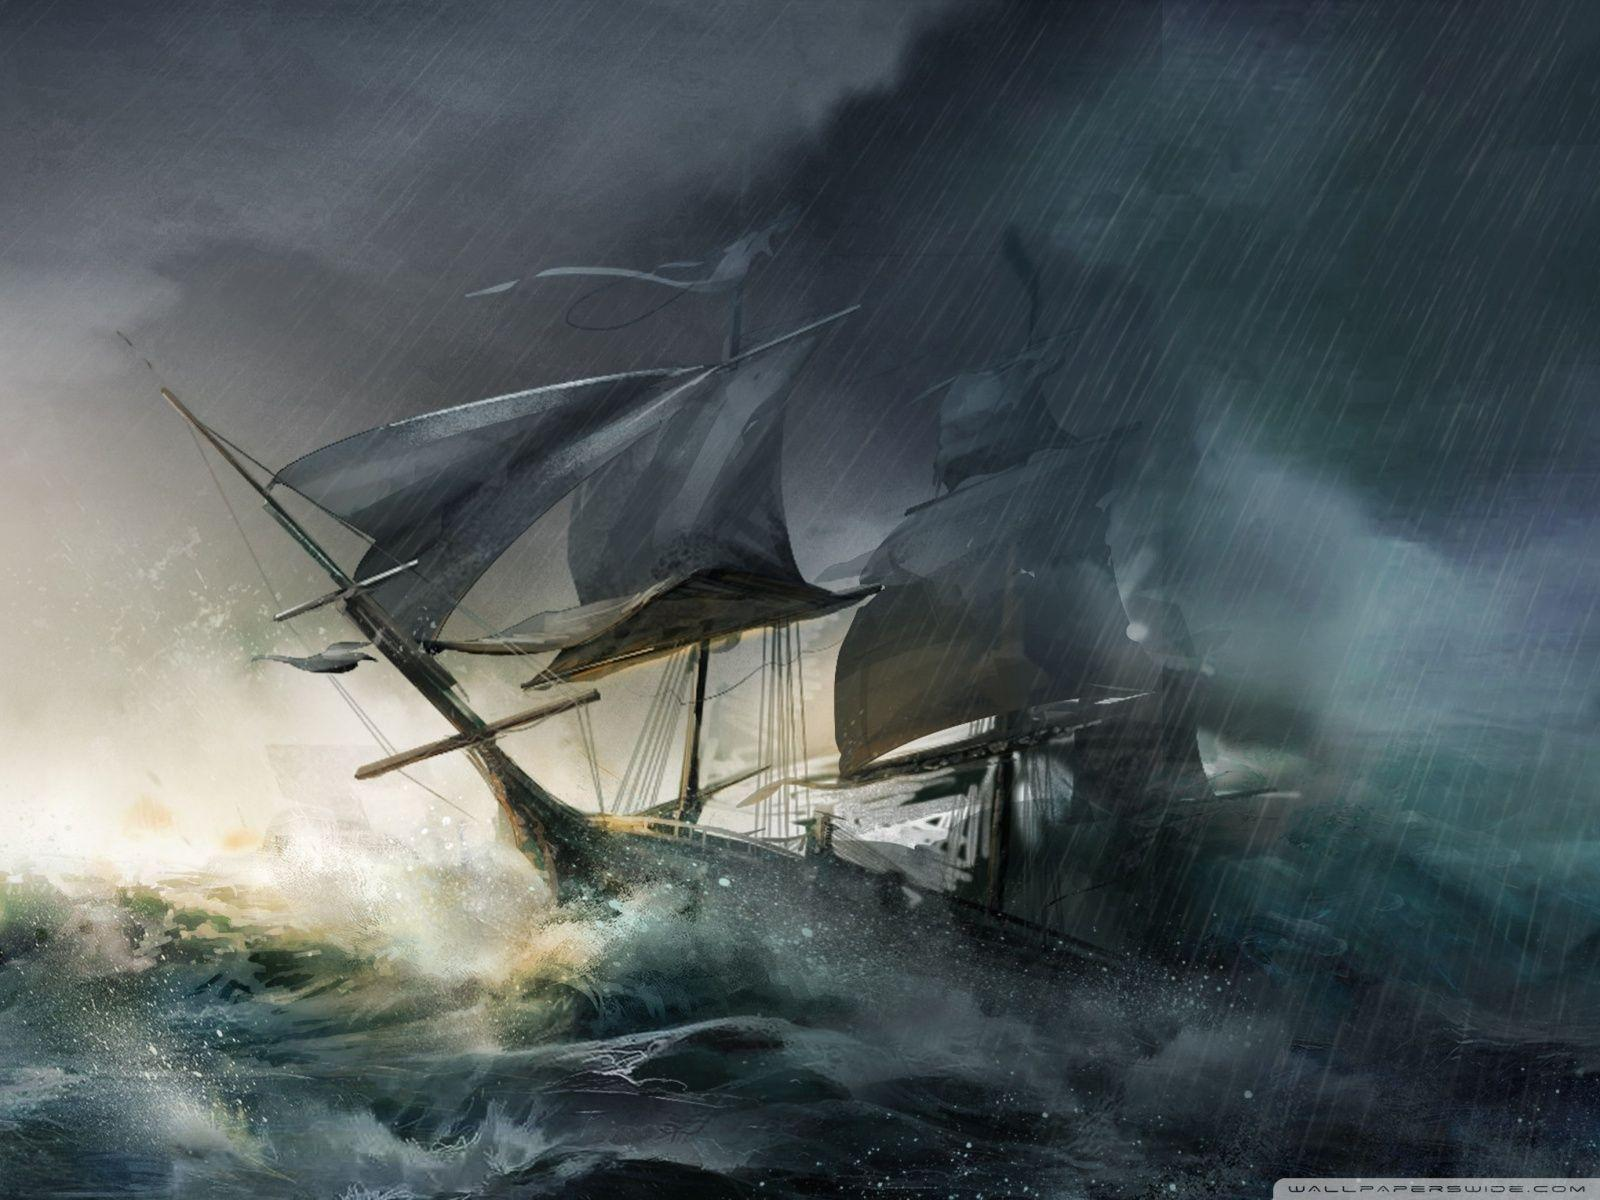 Картинки пиратских парусников в шторм